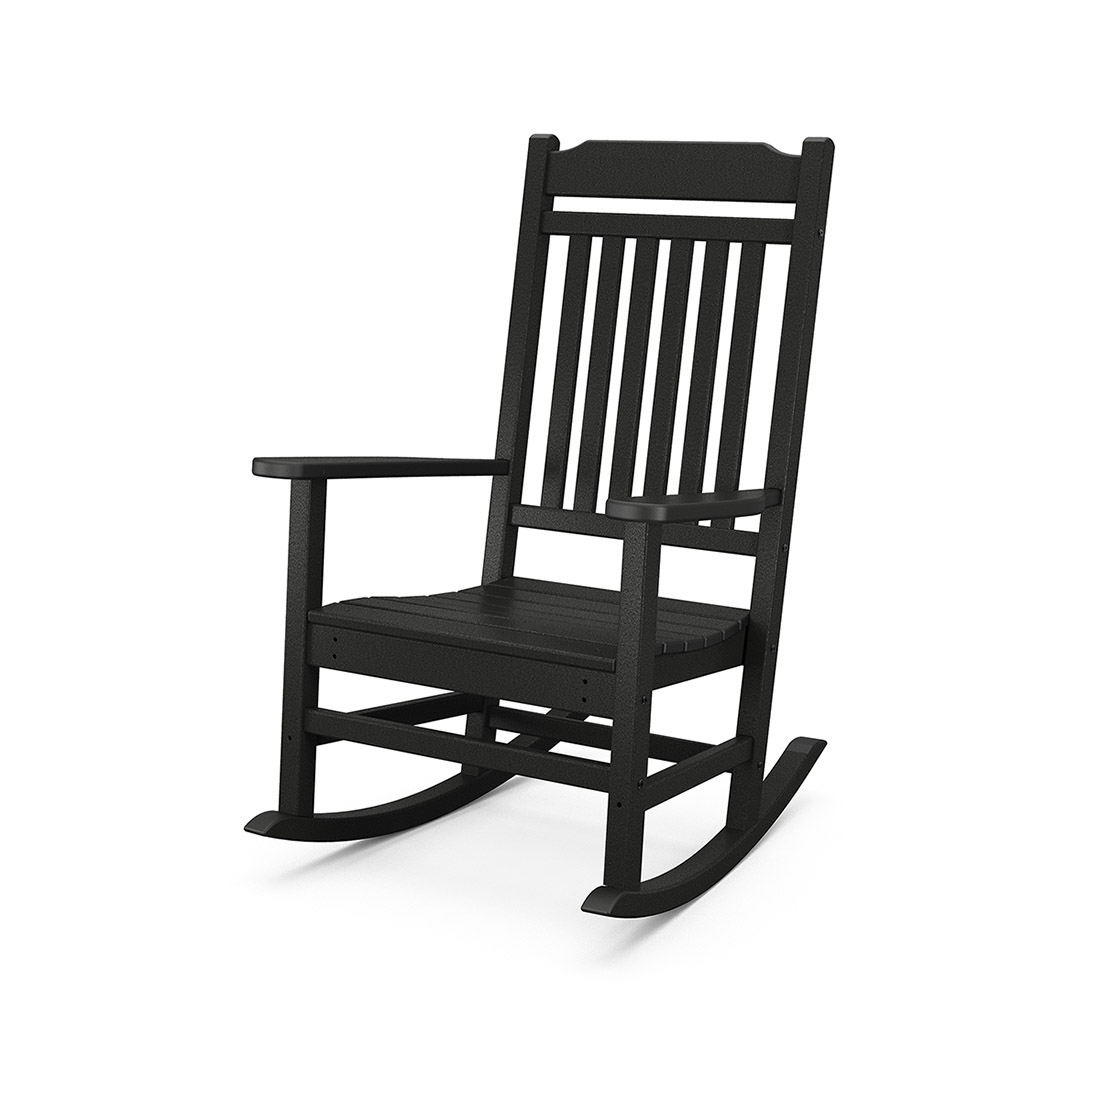 Outdoor Rocking Chairs Cracker Barrel